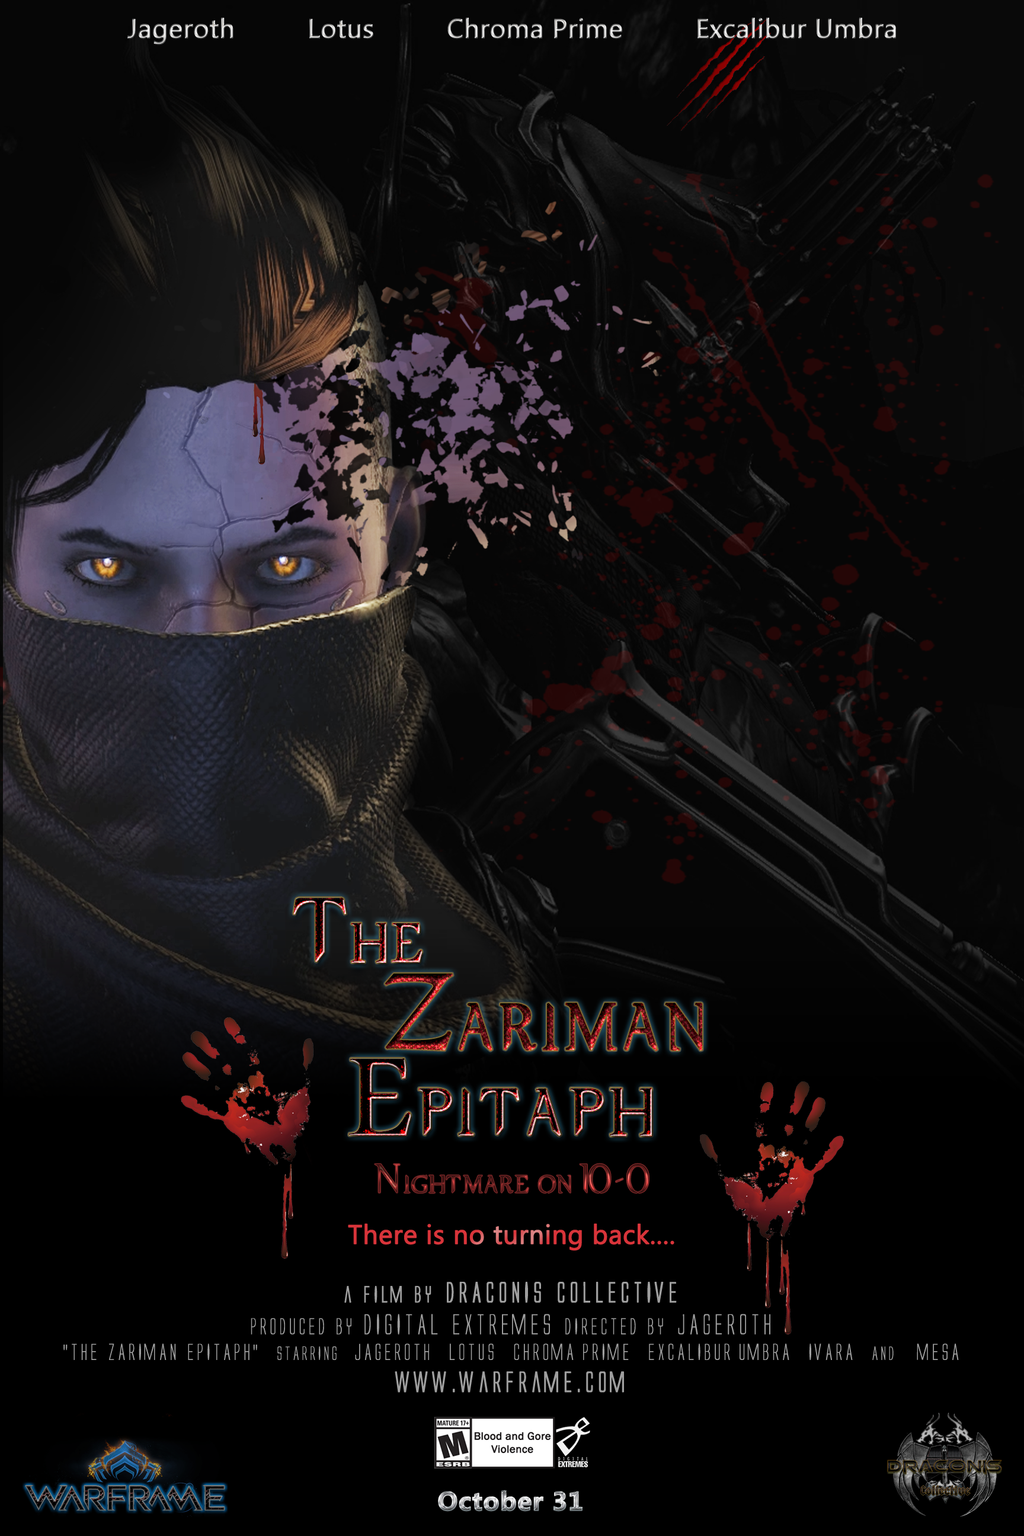 the_zariman_epitaph___nightmare_on_10_0_